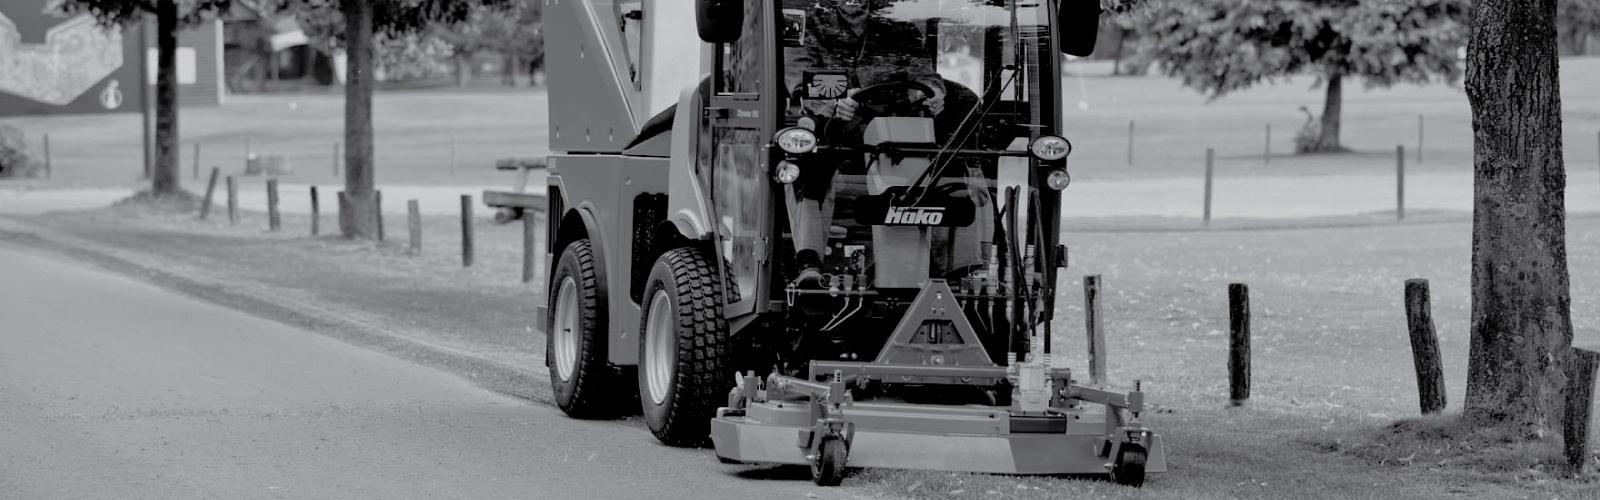 Citymaster 1600 Outdoor Footpath & Street Sweeper